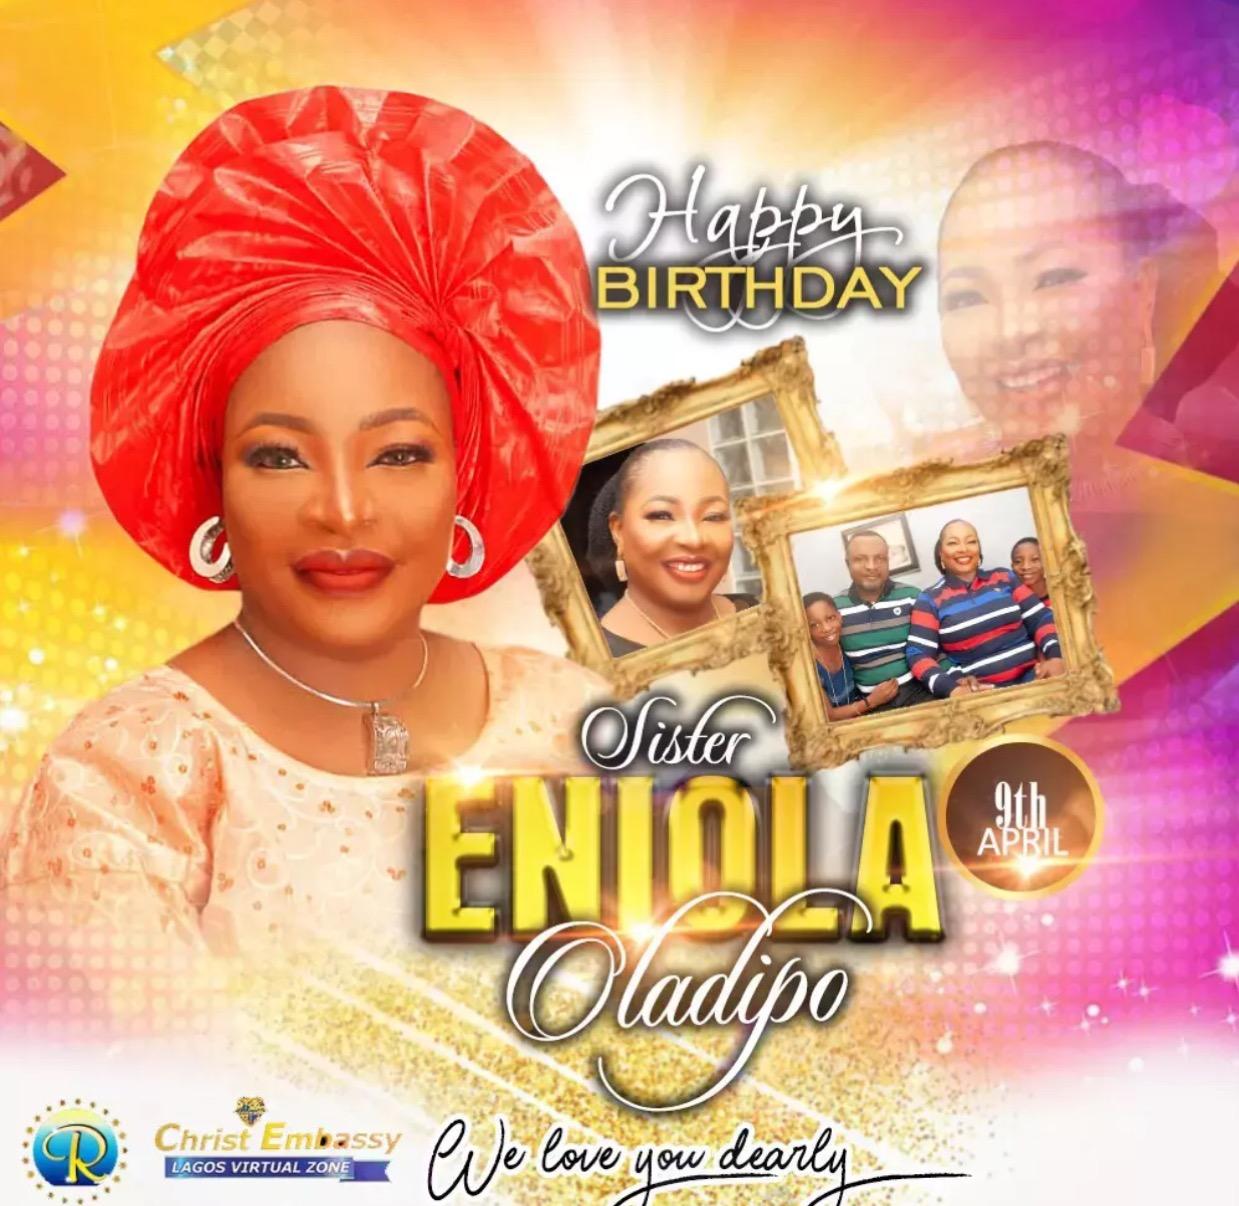 Happy birthday dearest Sister Eniola